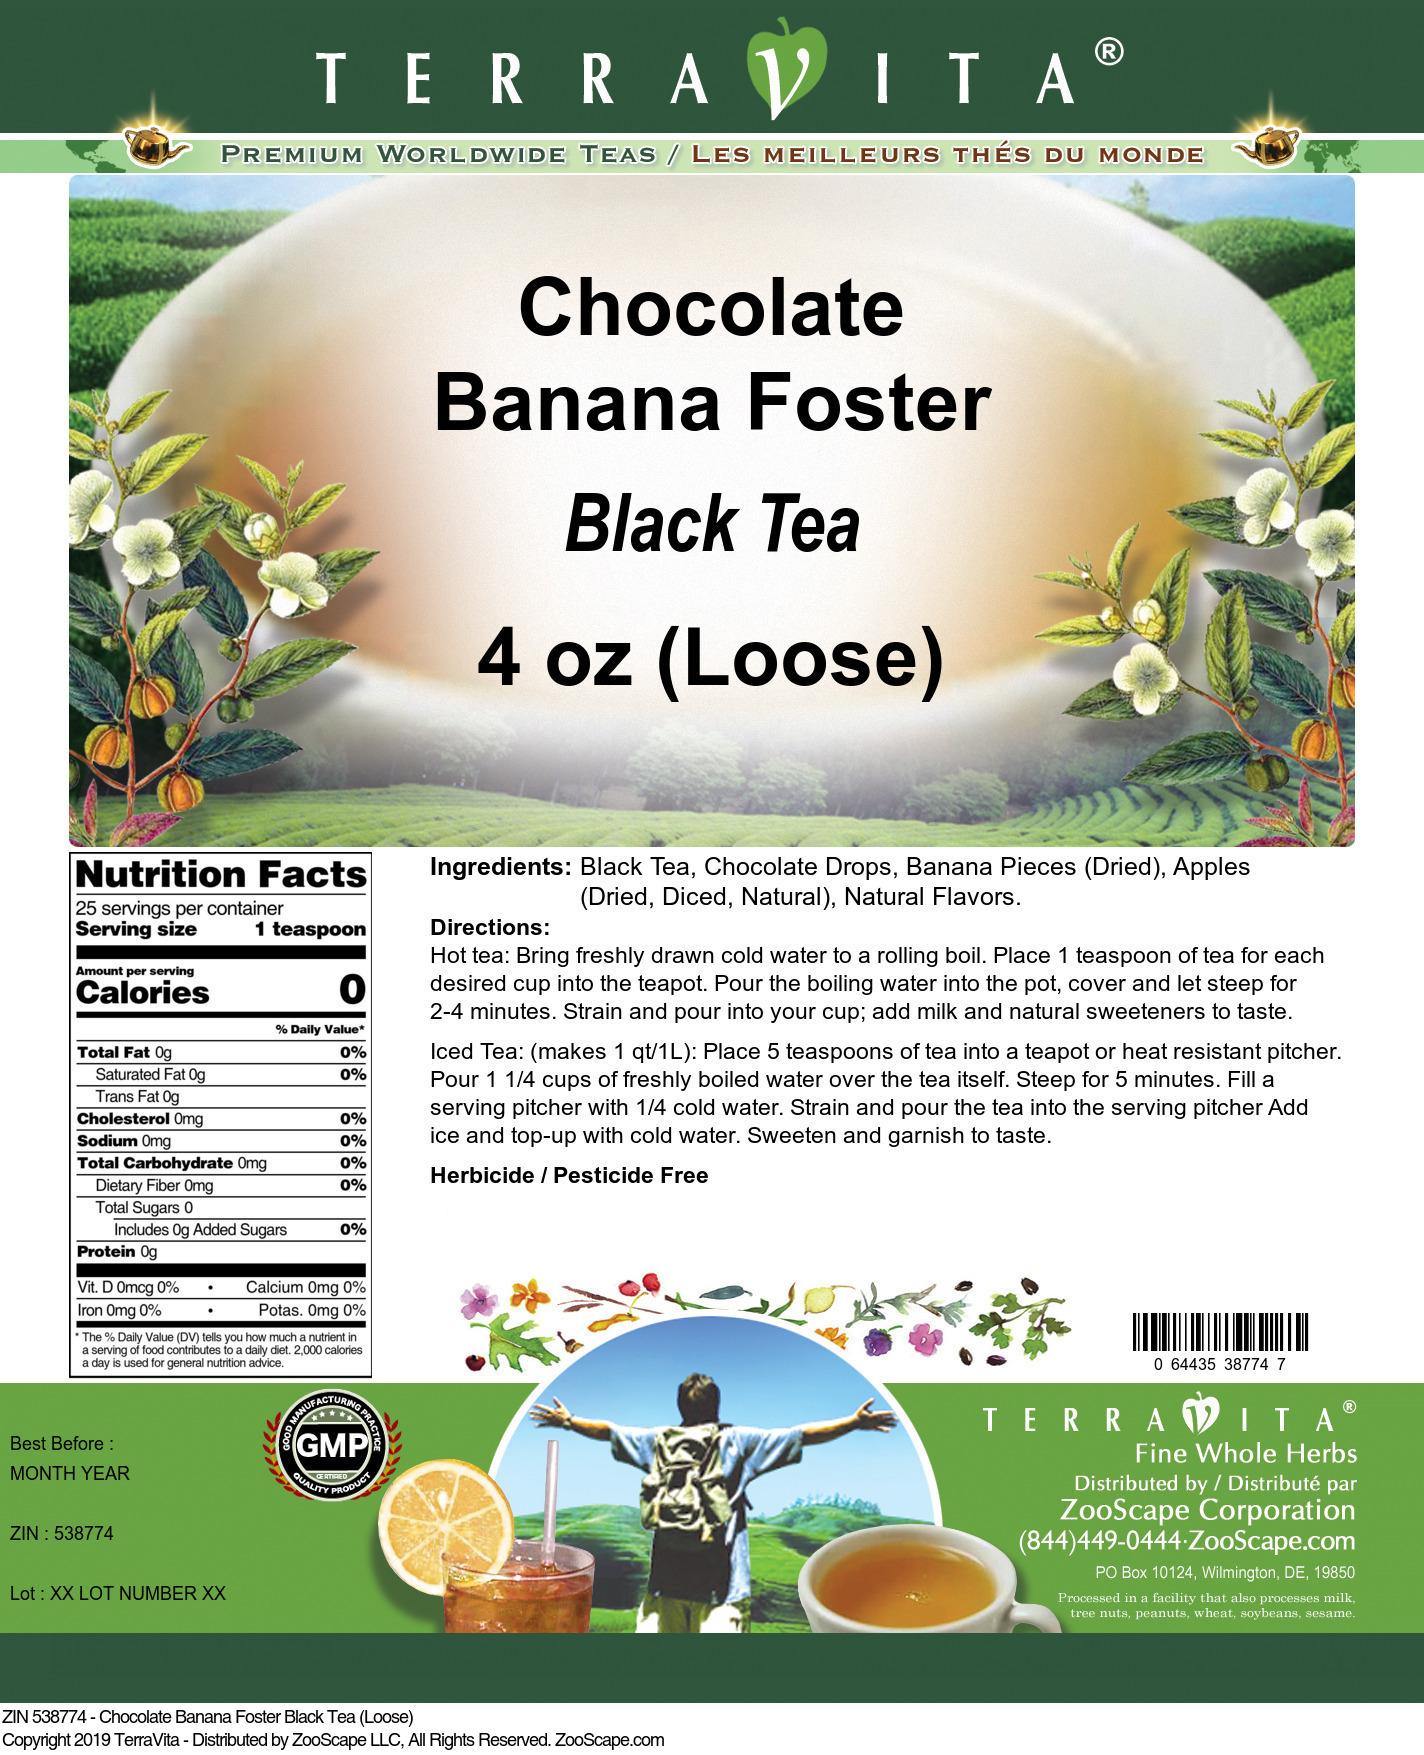 Chocolate Banana Foster Black Tea (Loose)